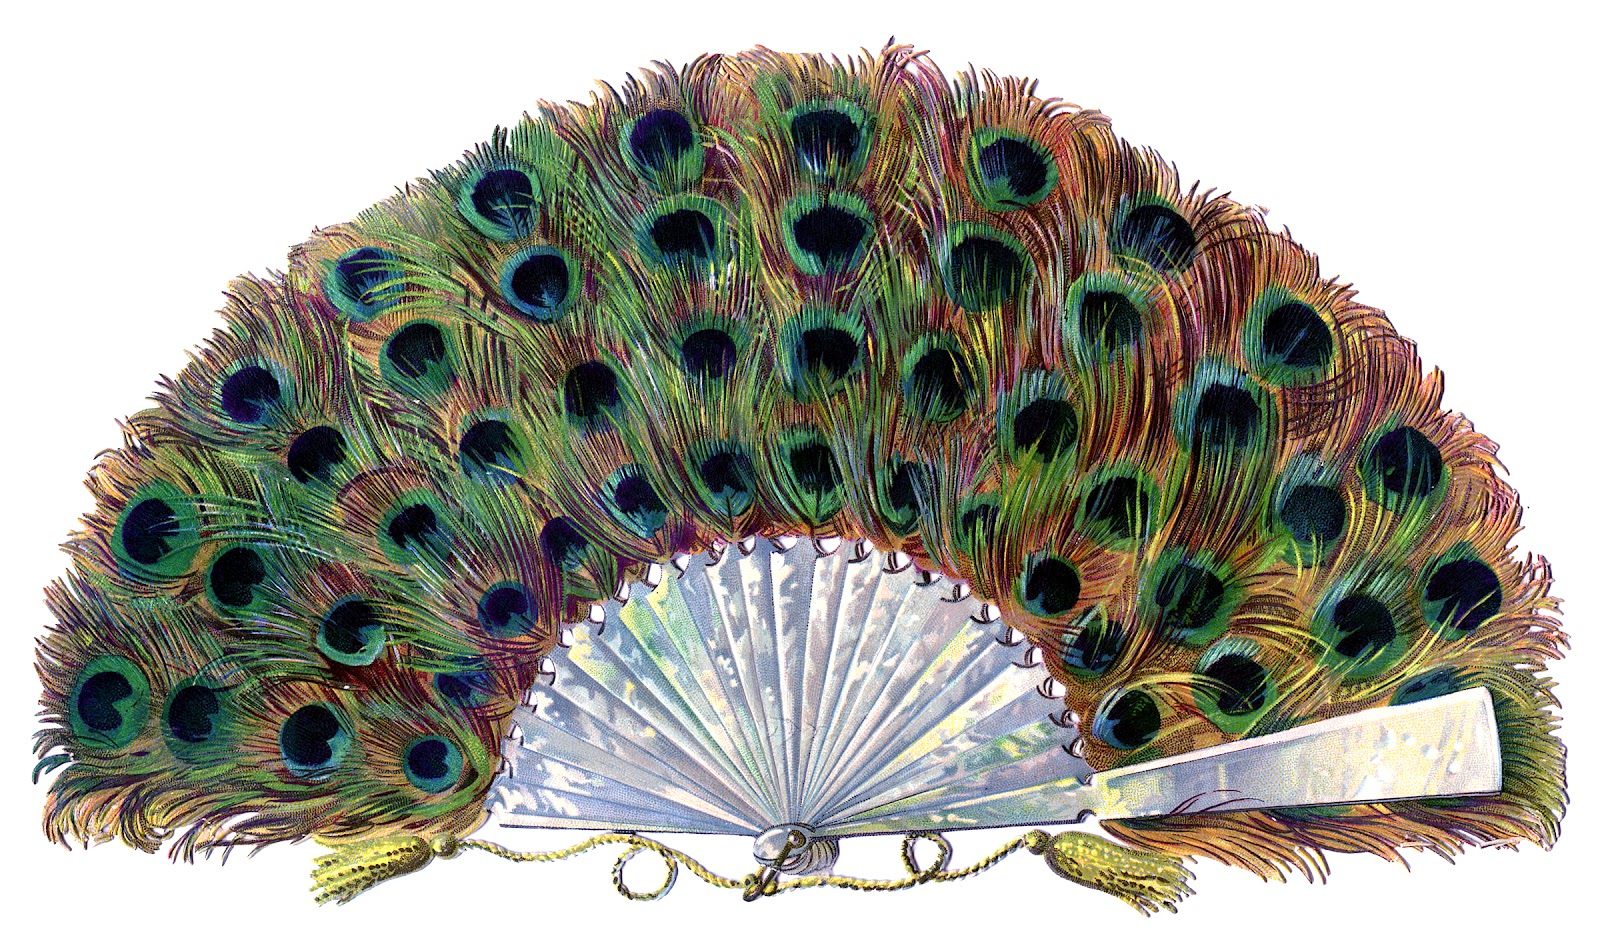 How to make paper peacock step by step - ArtsyCraftsyDad | 942x1600